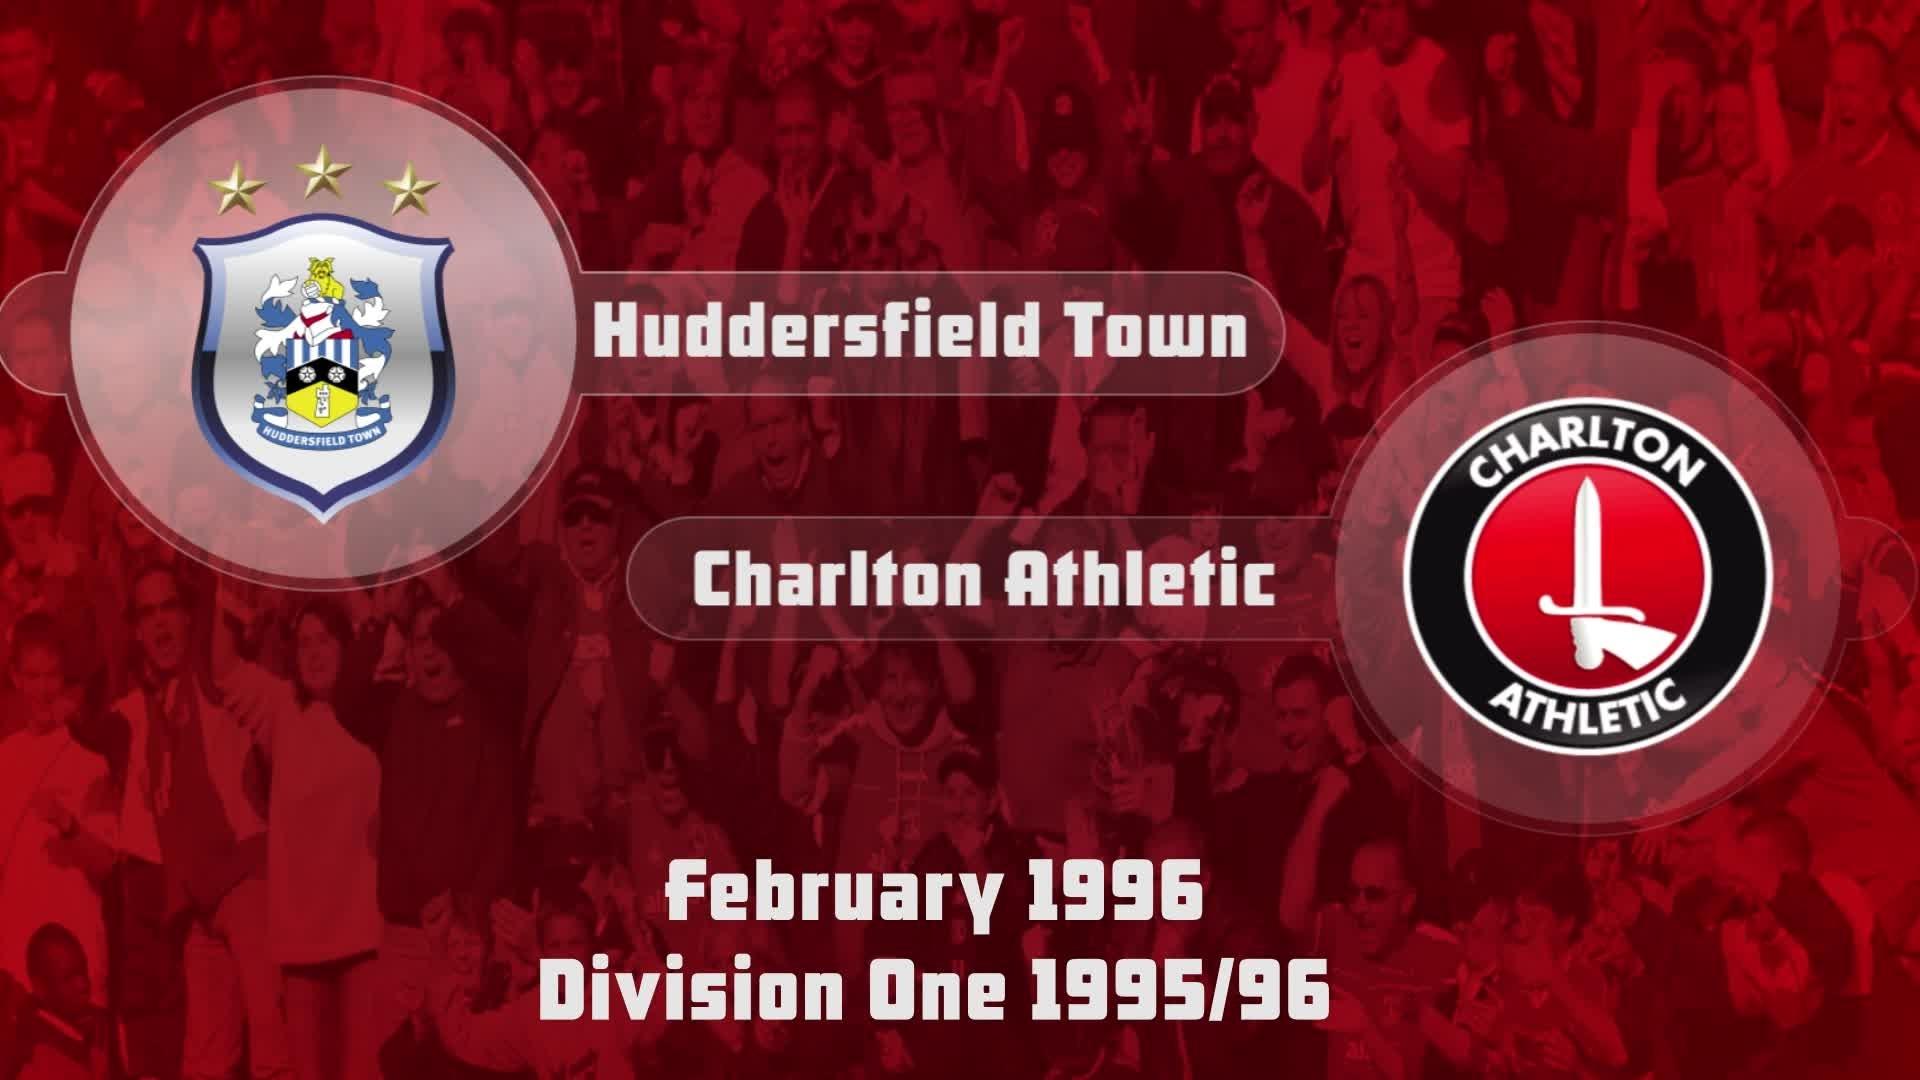 38 HIGHLIGHTS | Huddersfield Town 2 Charlton 2 (Feb 1996)